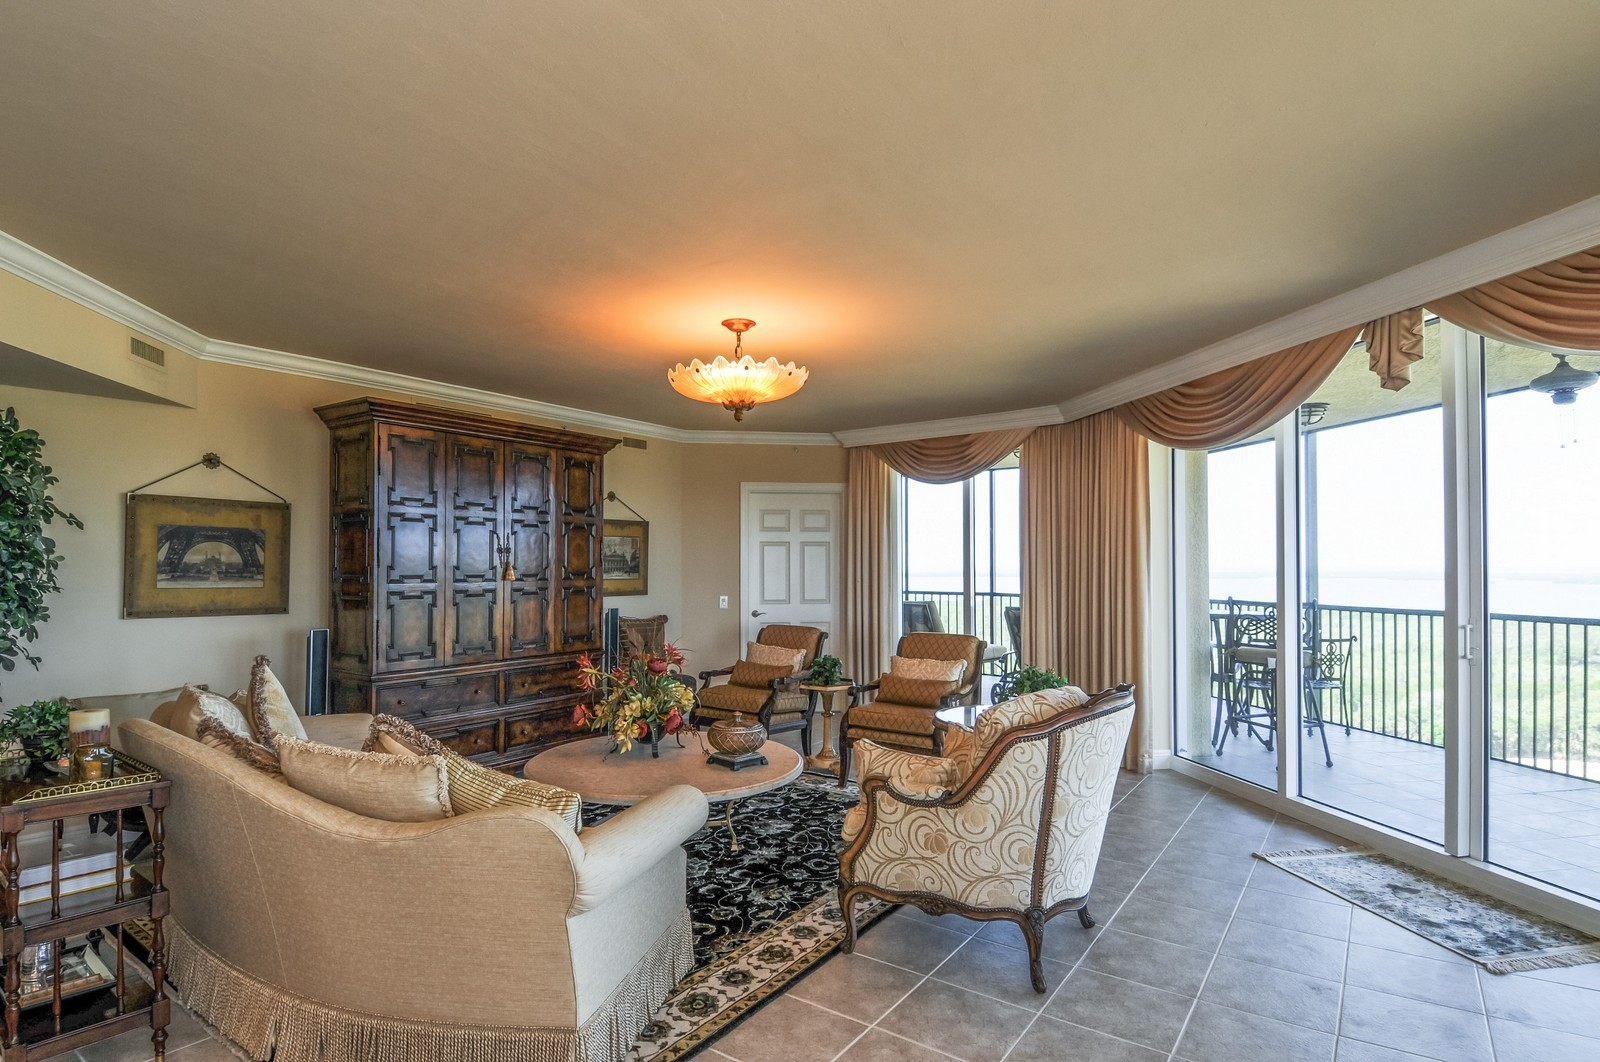 Real Estate Photography - 23540 Via Veneto, Unit 1705, Bonita Springs, FL, 34134 - Living Room